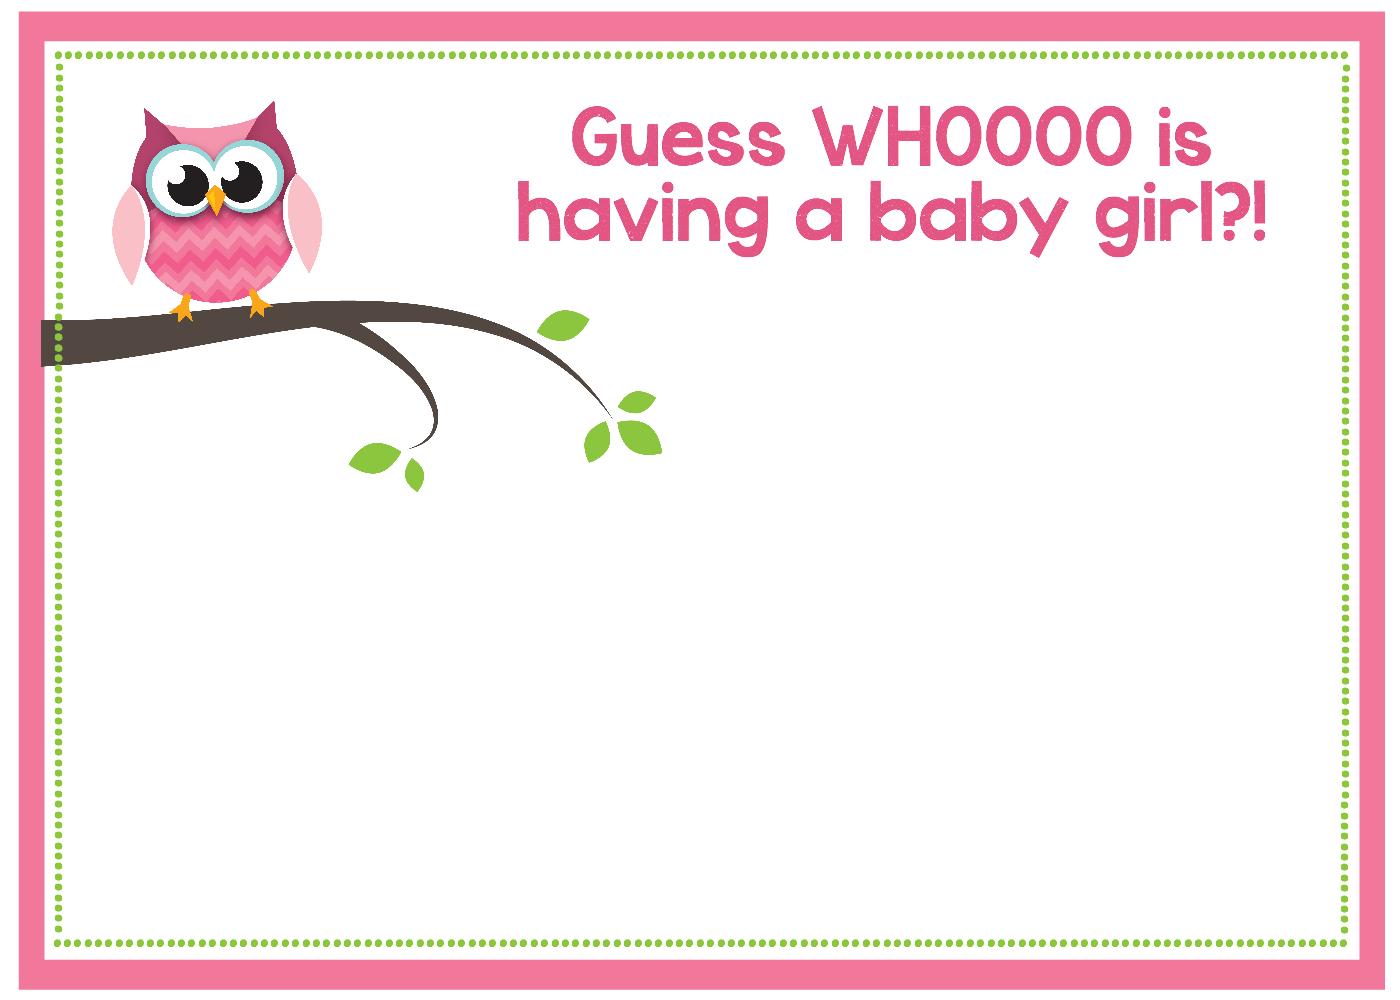 Free Printable Owl Baby Shower Invitations {& Other Printables} - Free Printable Baby Shower Invitations